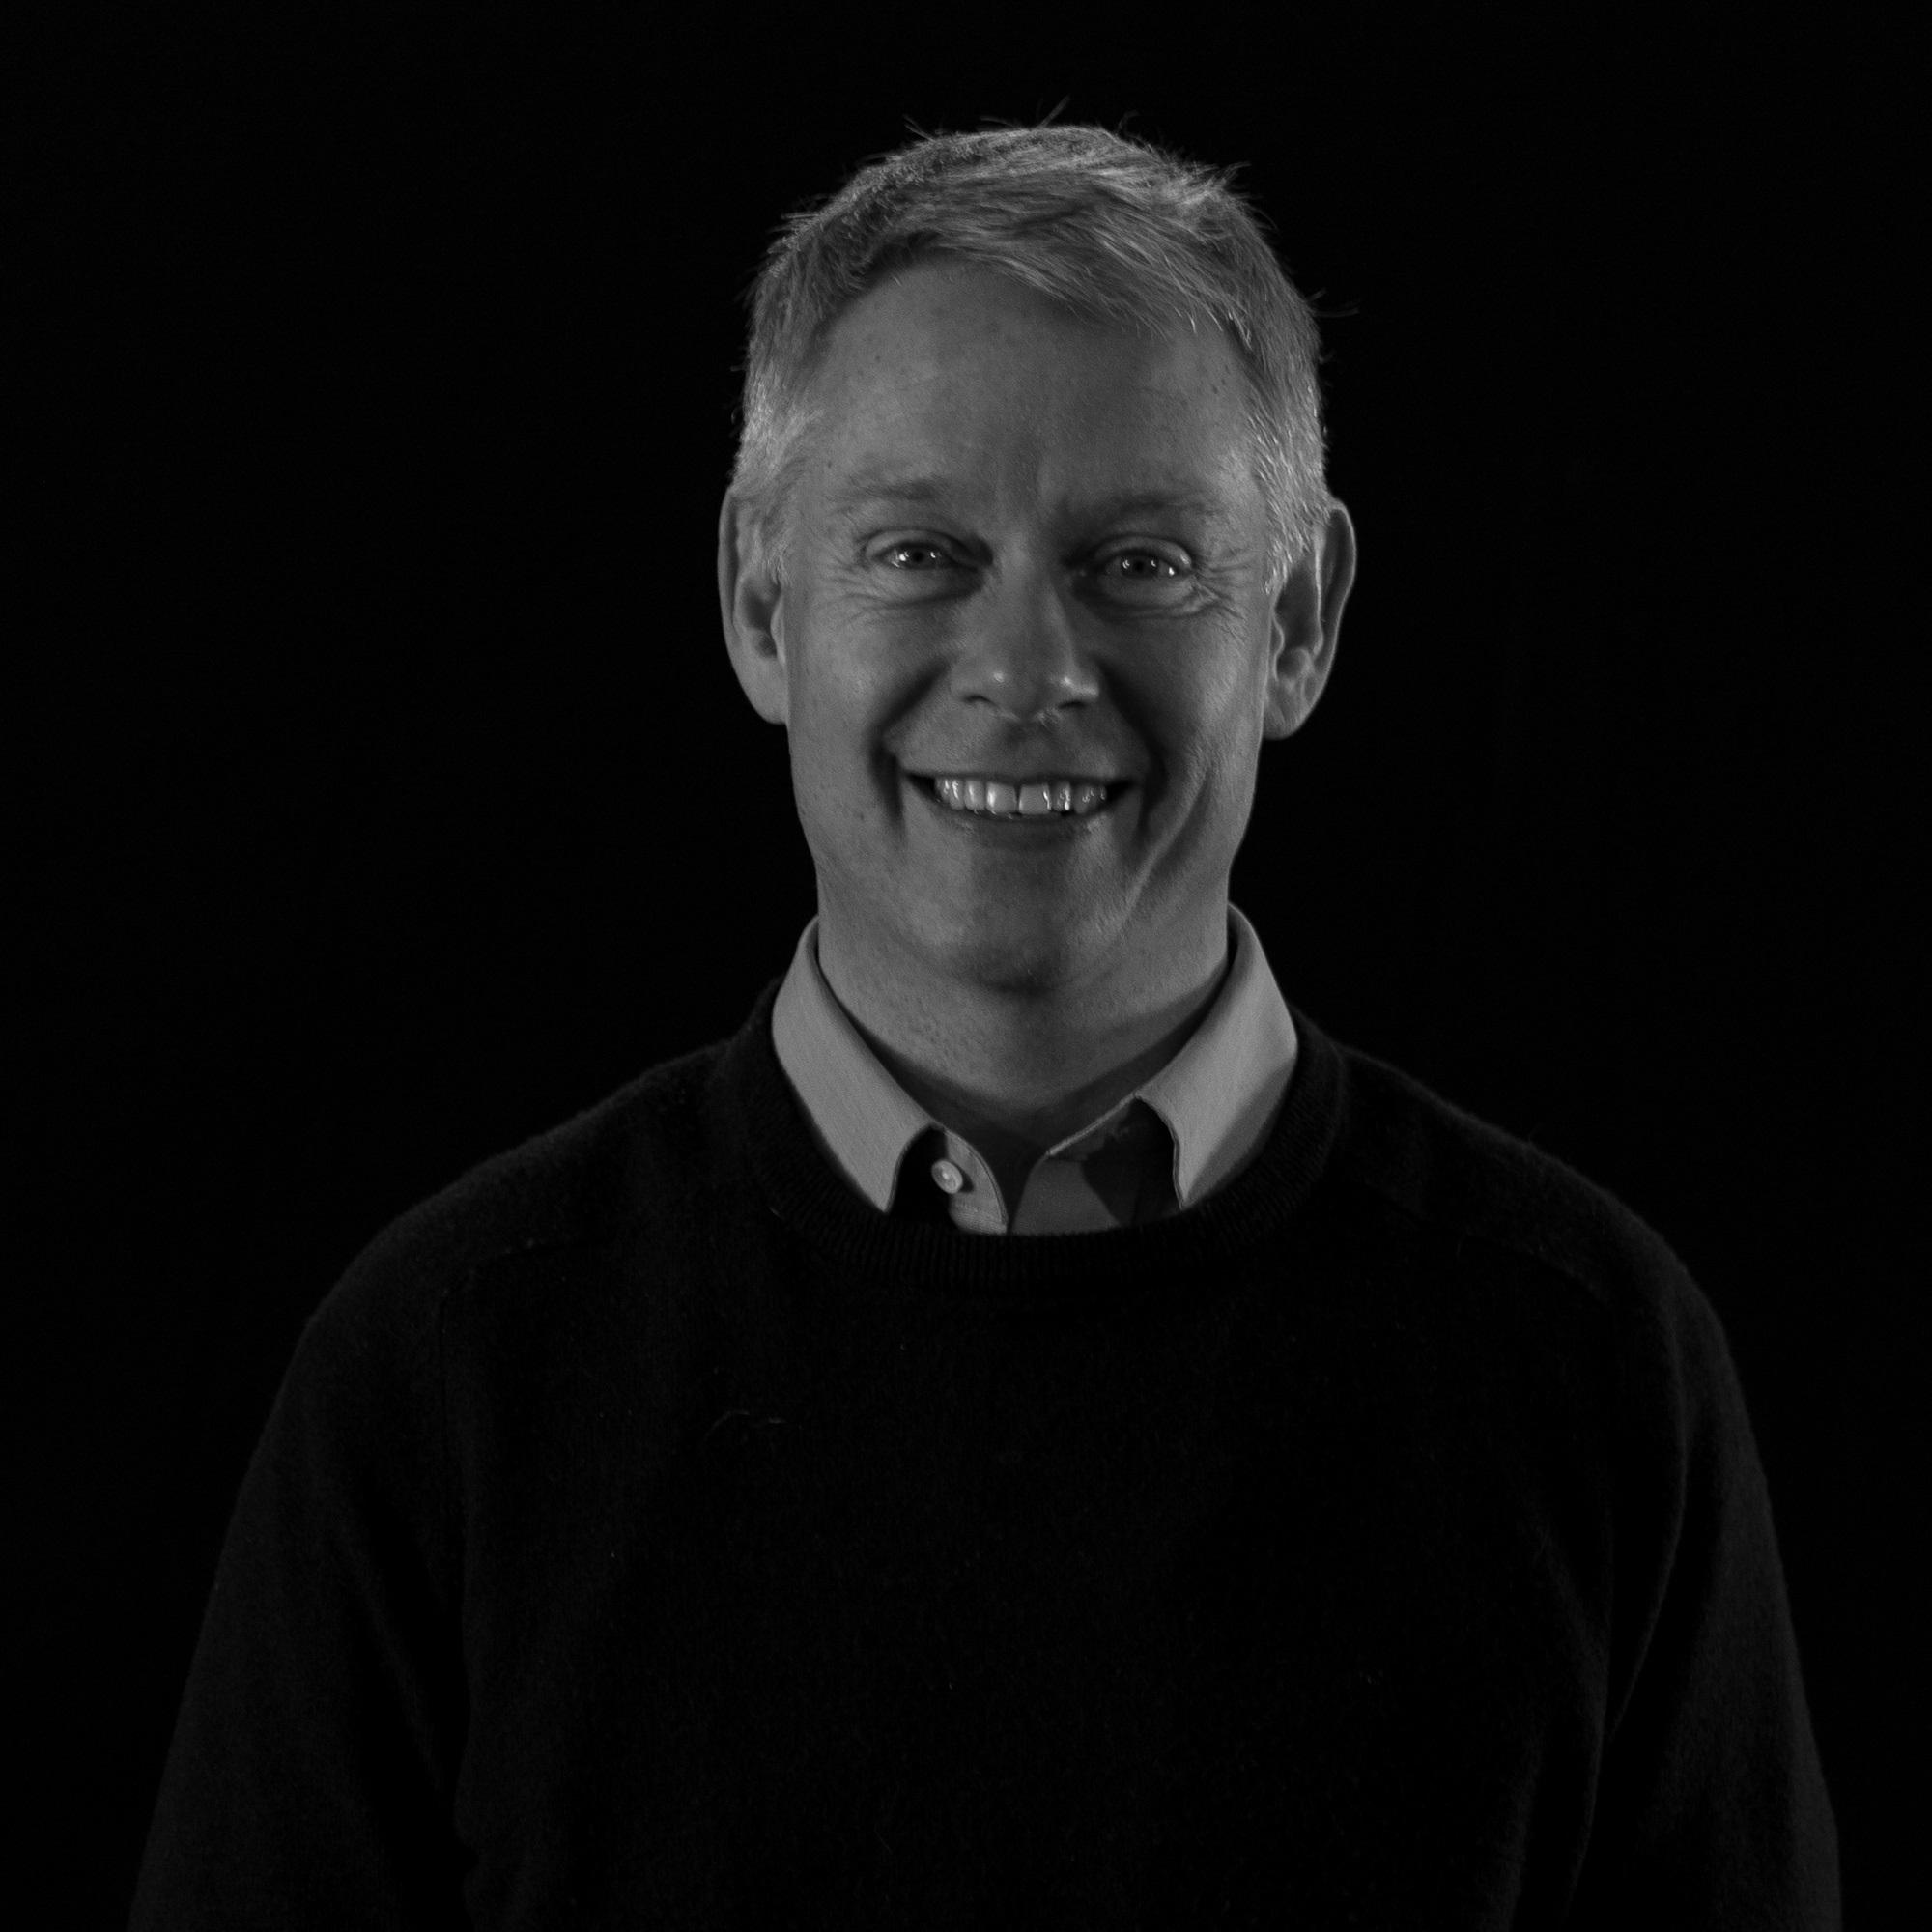 Niclas Svenningsen photo